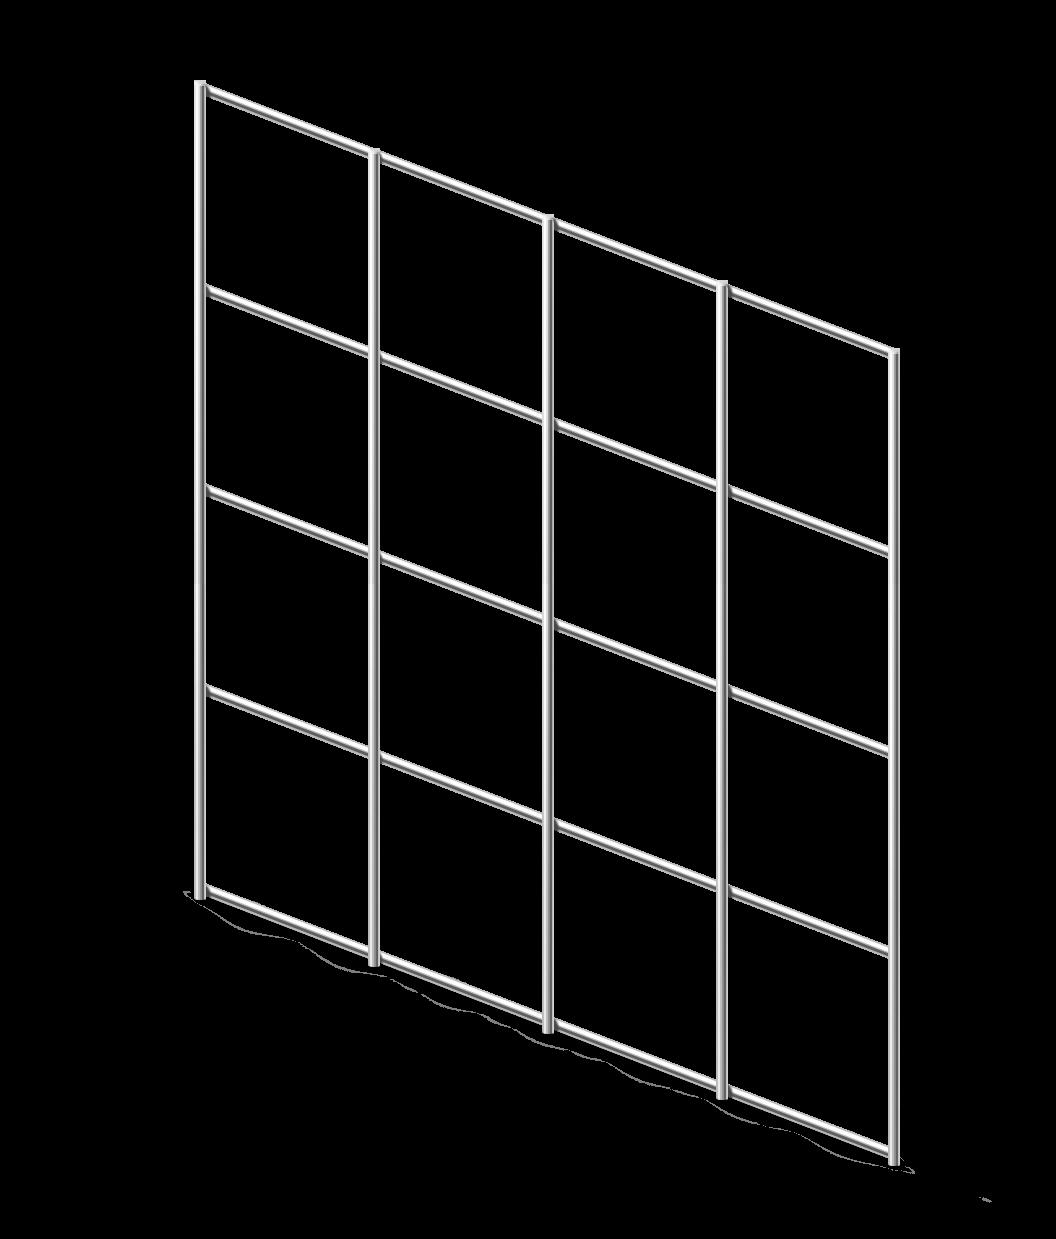 Сетка сварная ОЦ 50х50 мм., d 1,6 мм., 0,5 м.